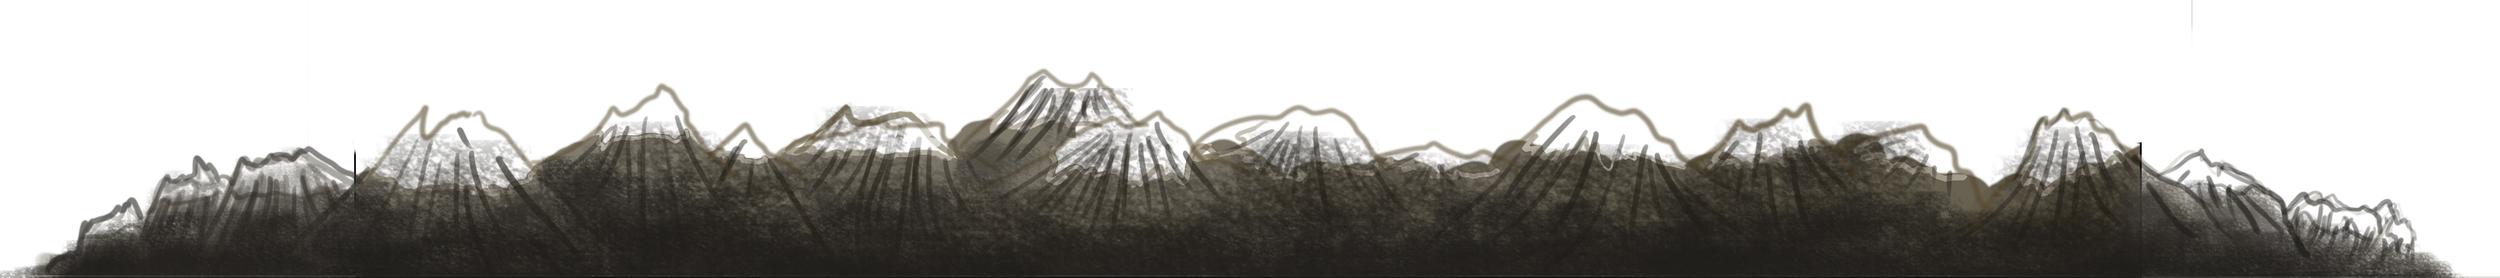 Groundrow Elevation